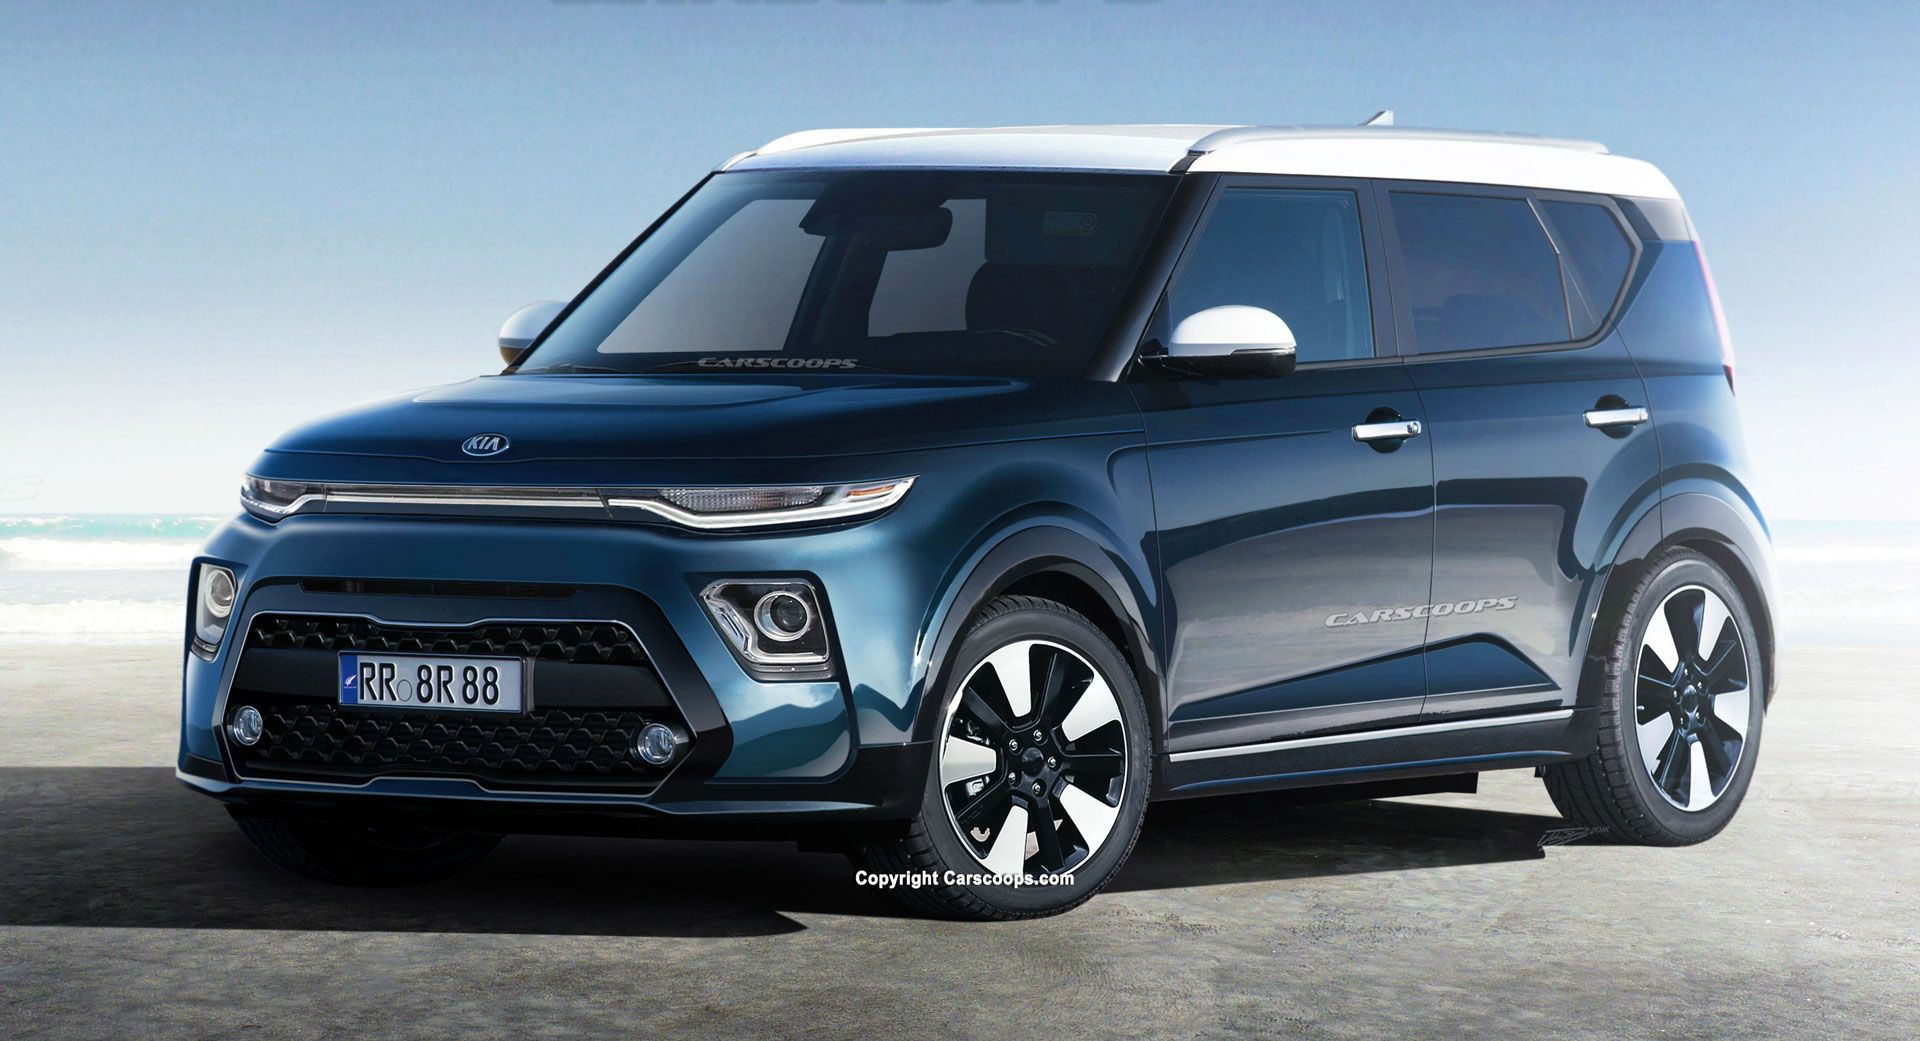 2020 Kia Soul Looks Interior Engines And Everything Else We Know Carscoops Kia Soul Interior Kia Soul Kia